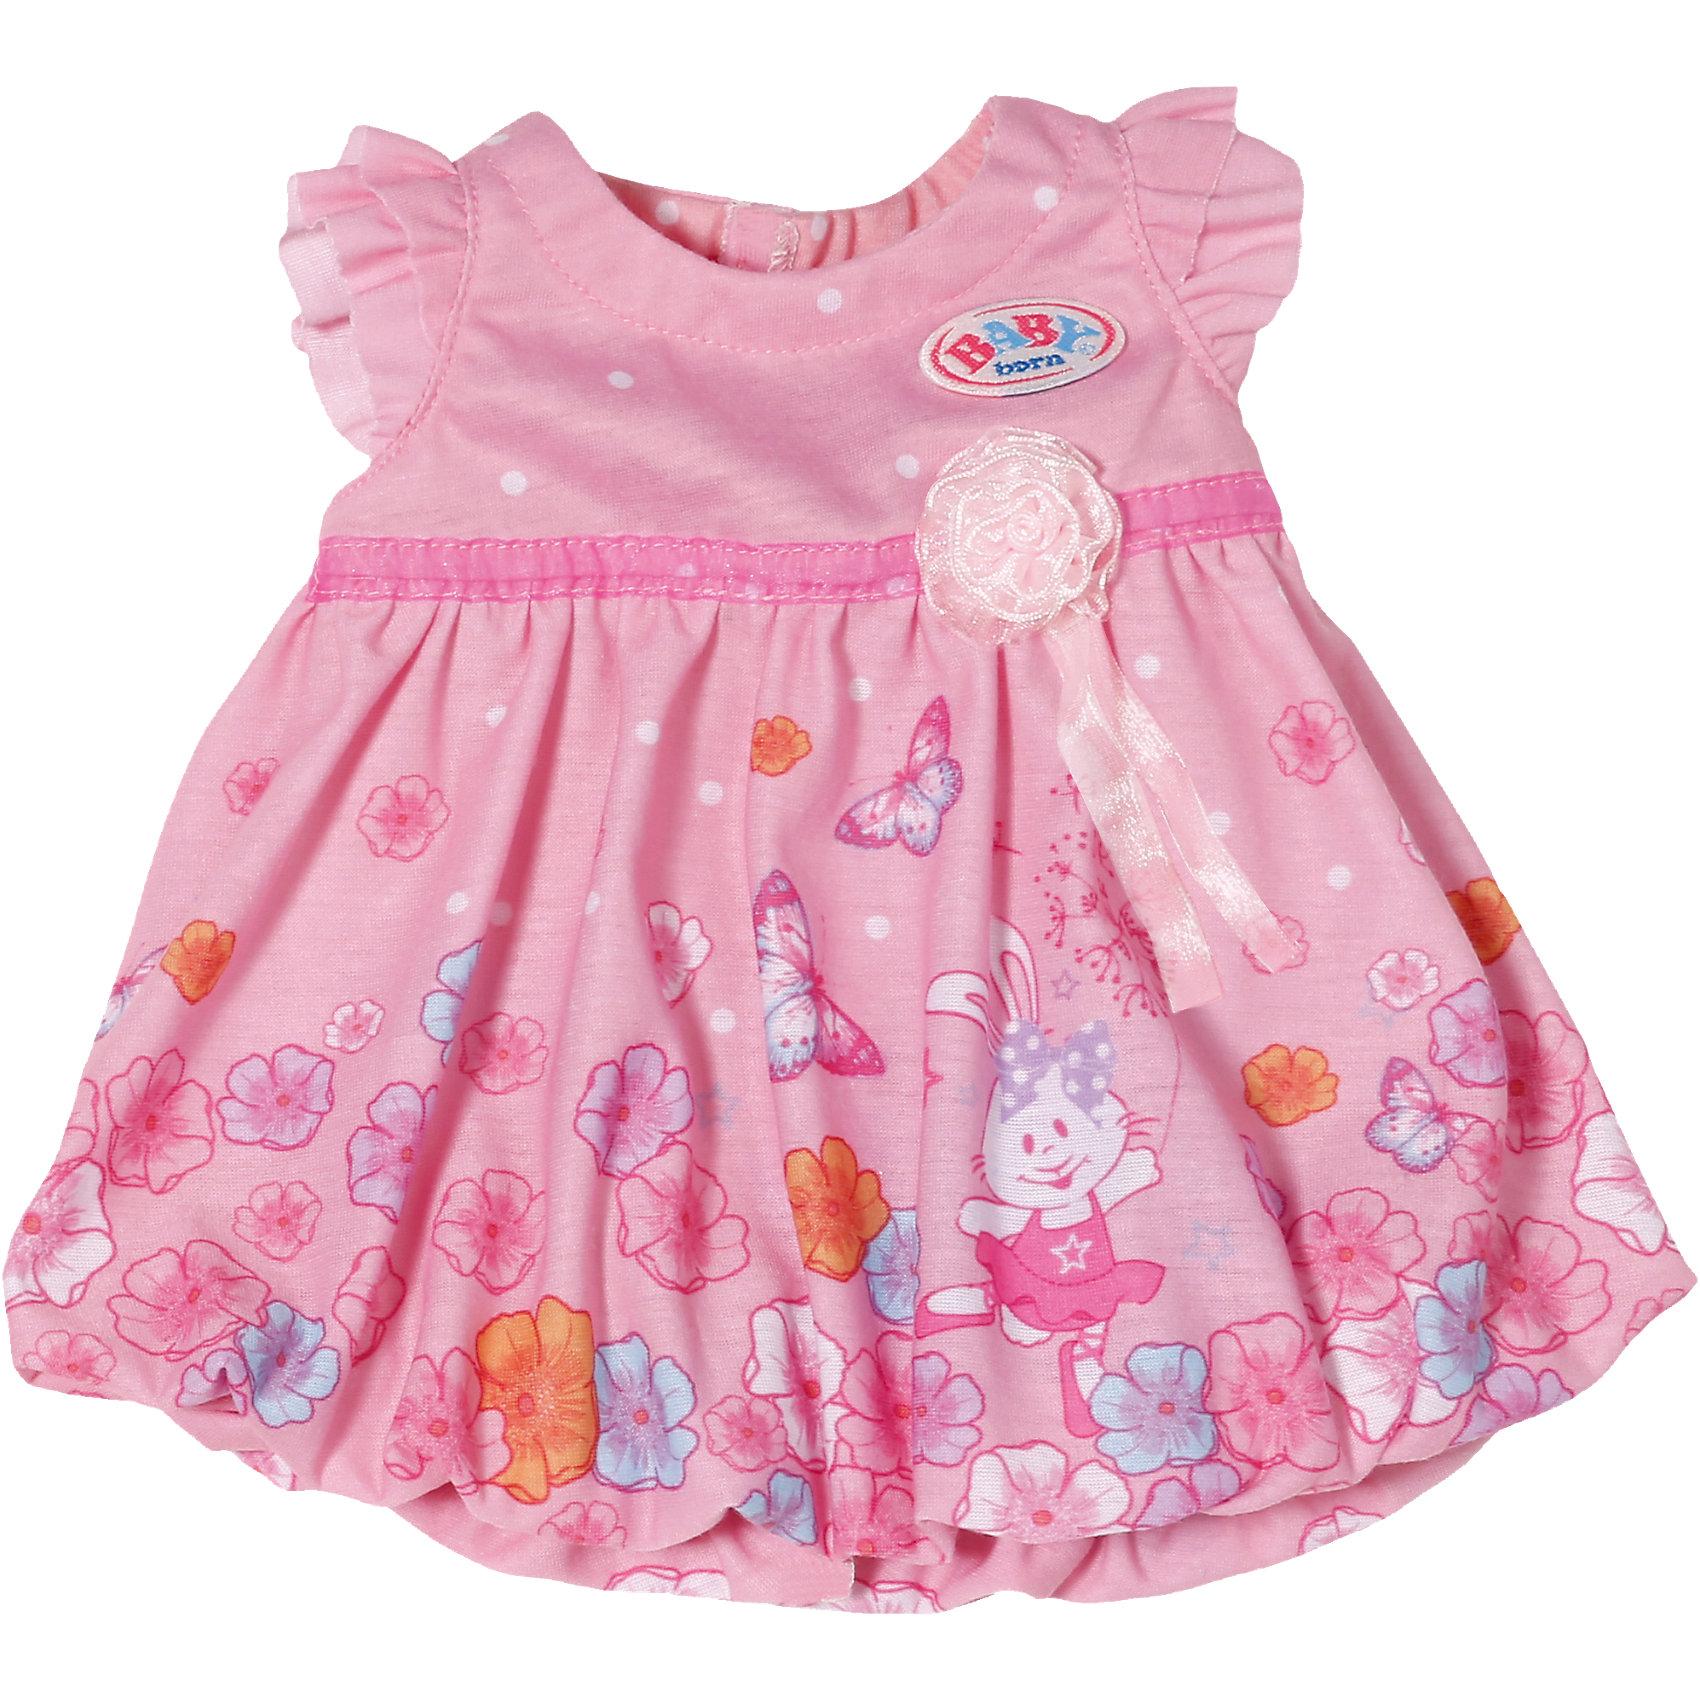 Zapf Creation Платье для куклы, BABY born, в ассортименте беби борн недорого зимняя красавица